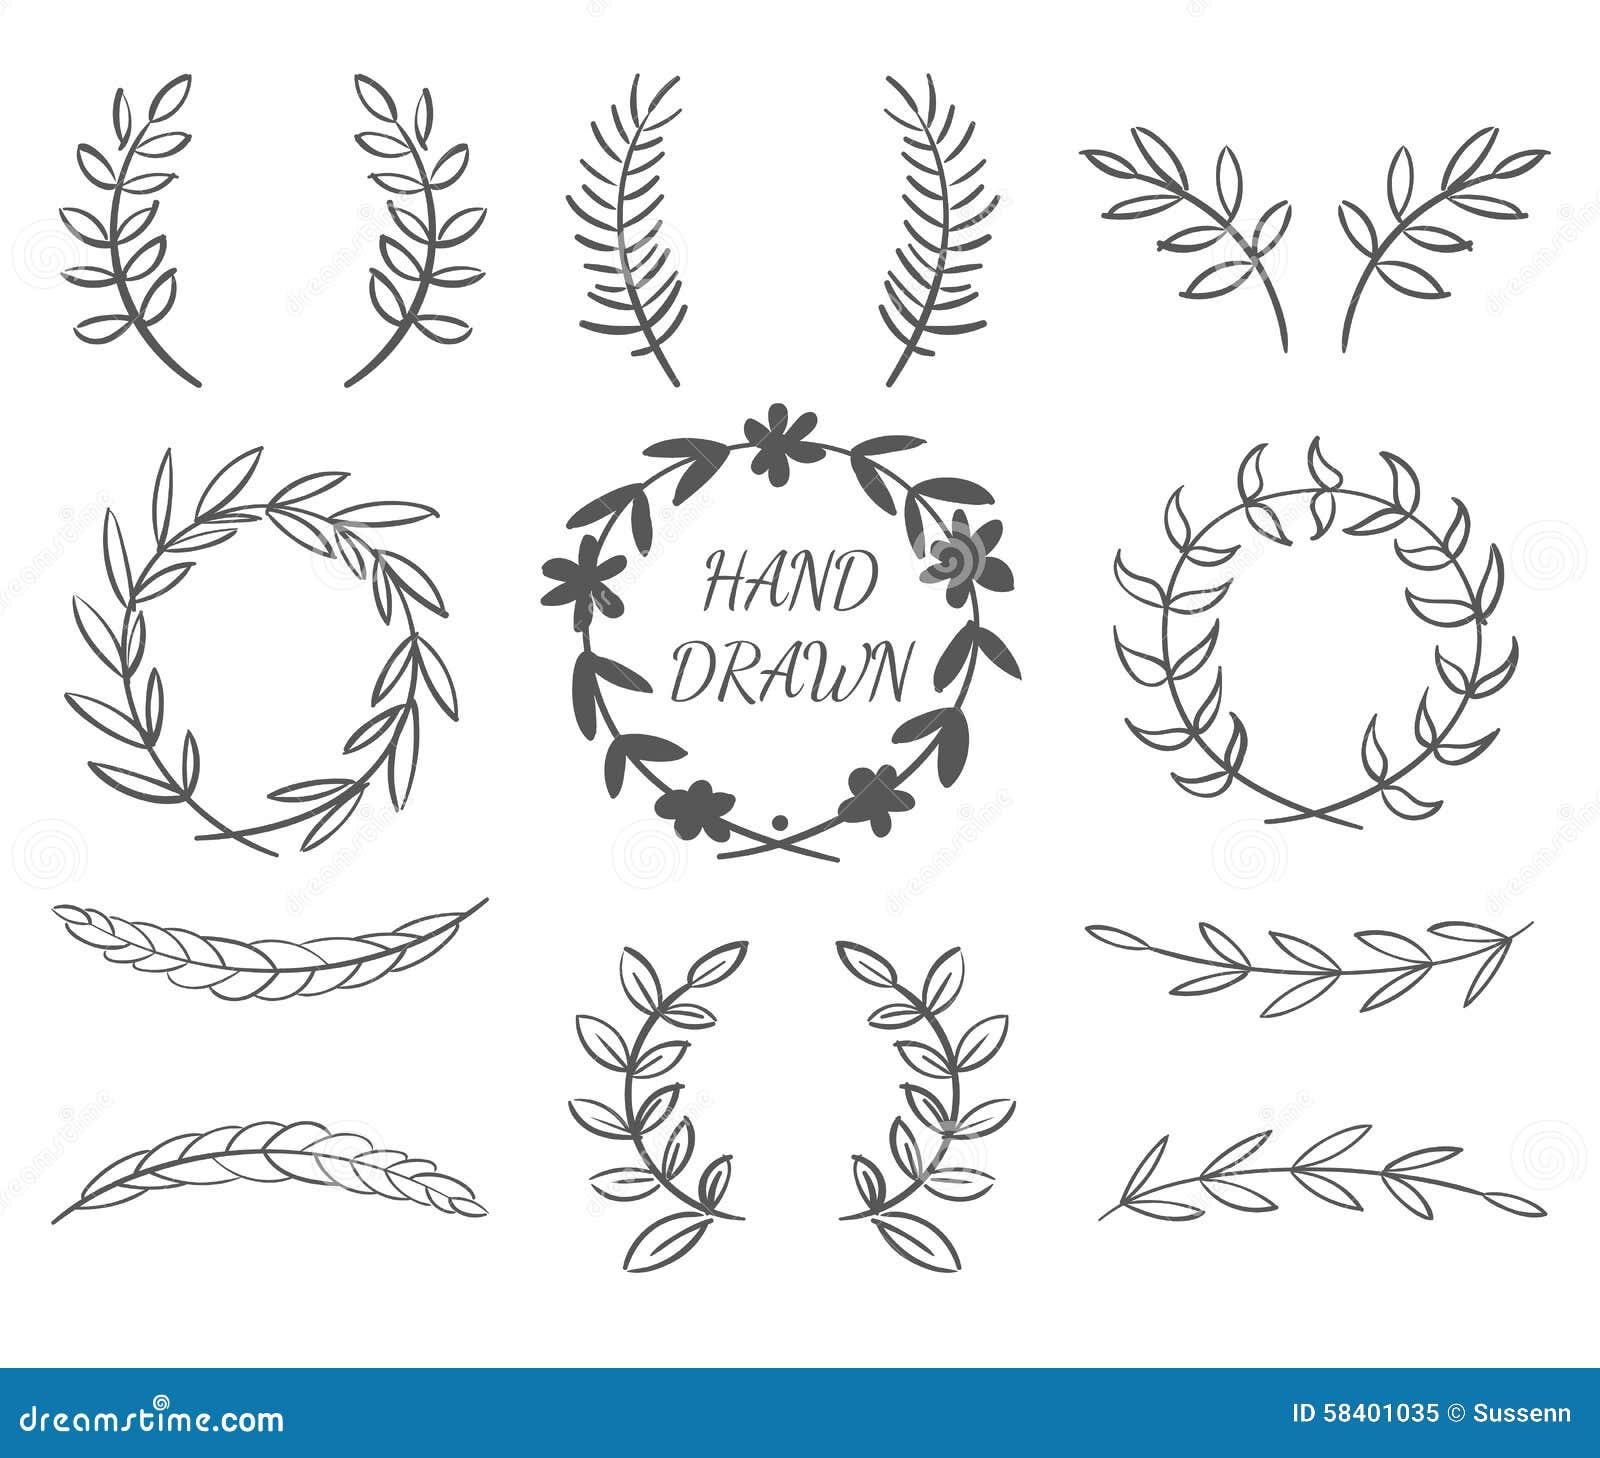 Hand Drawn Borders Stock Illustration - Image: 58401035